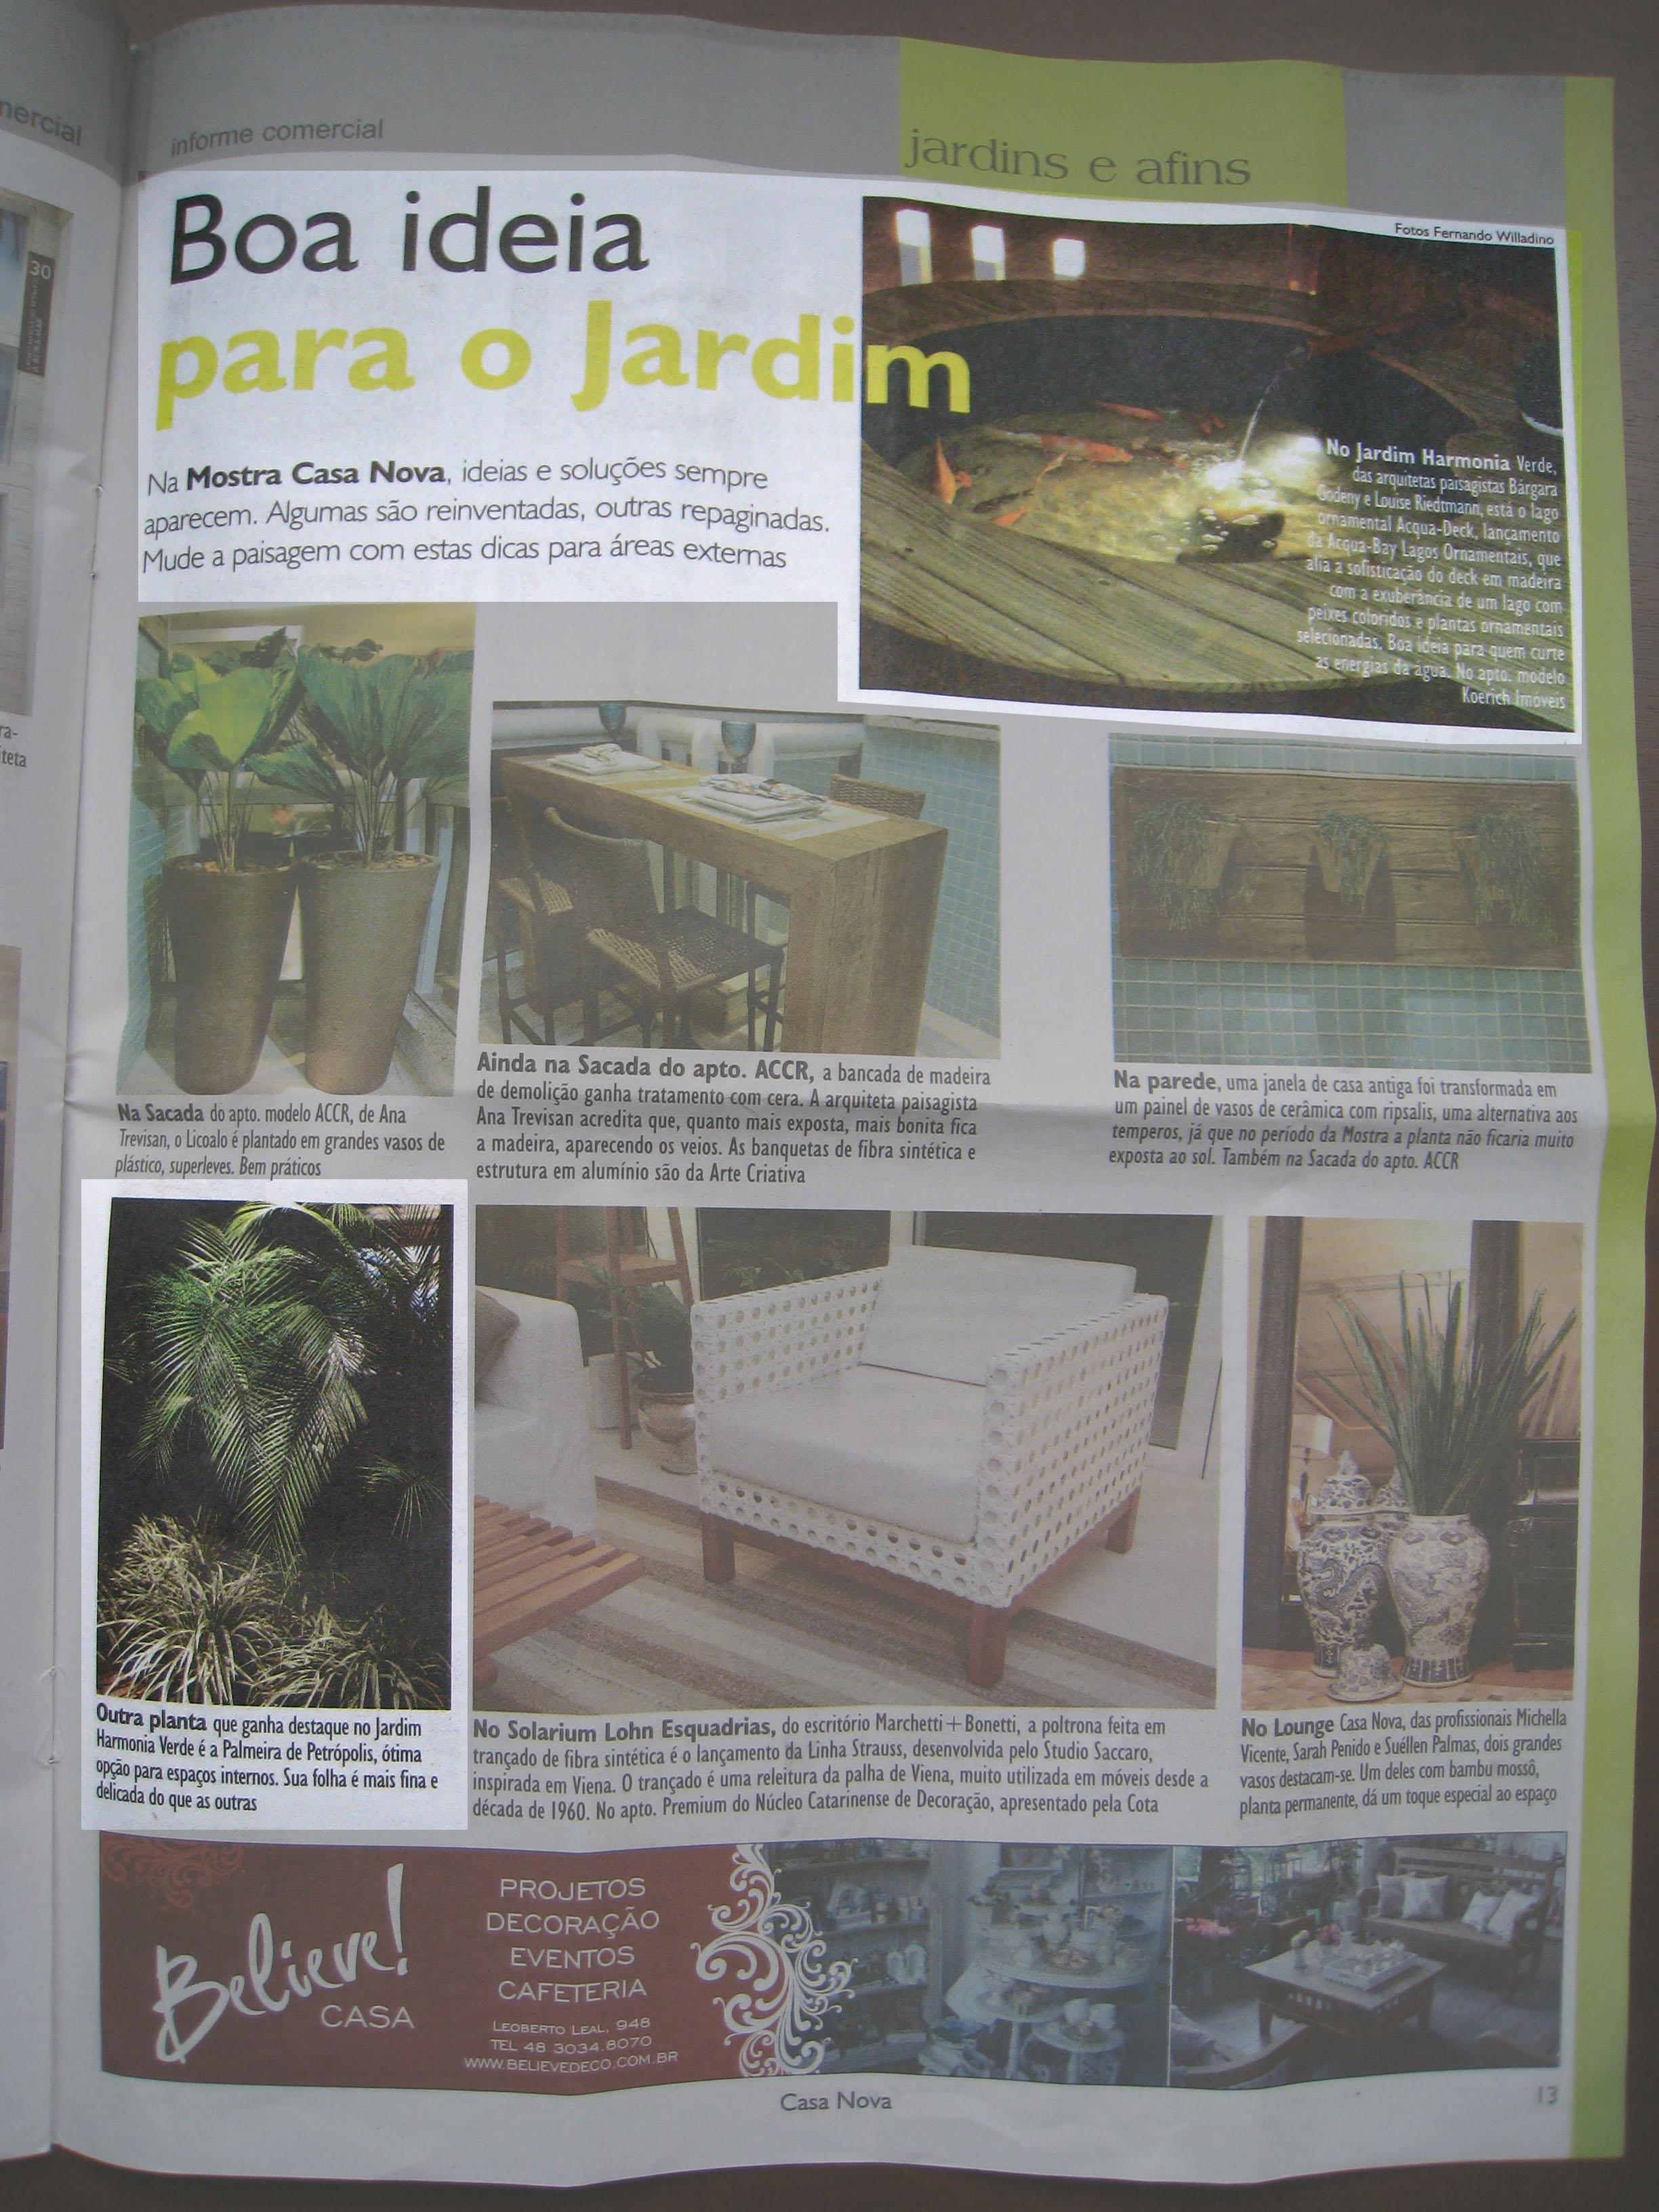 harmonia_verde_paisagismo_diario_catarinense_18_julho_2010